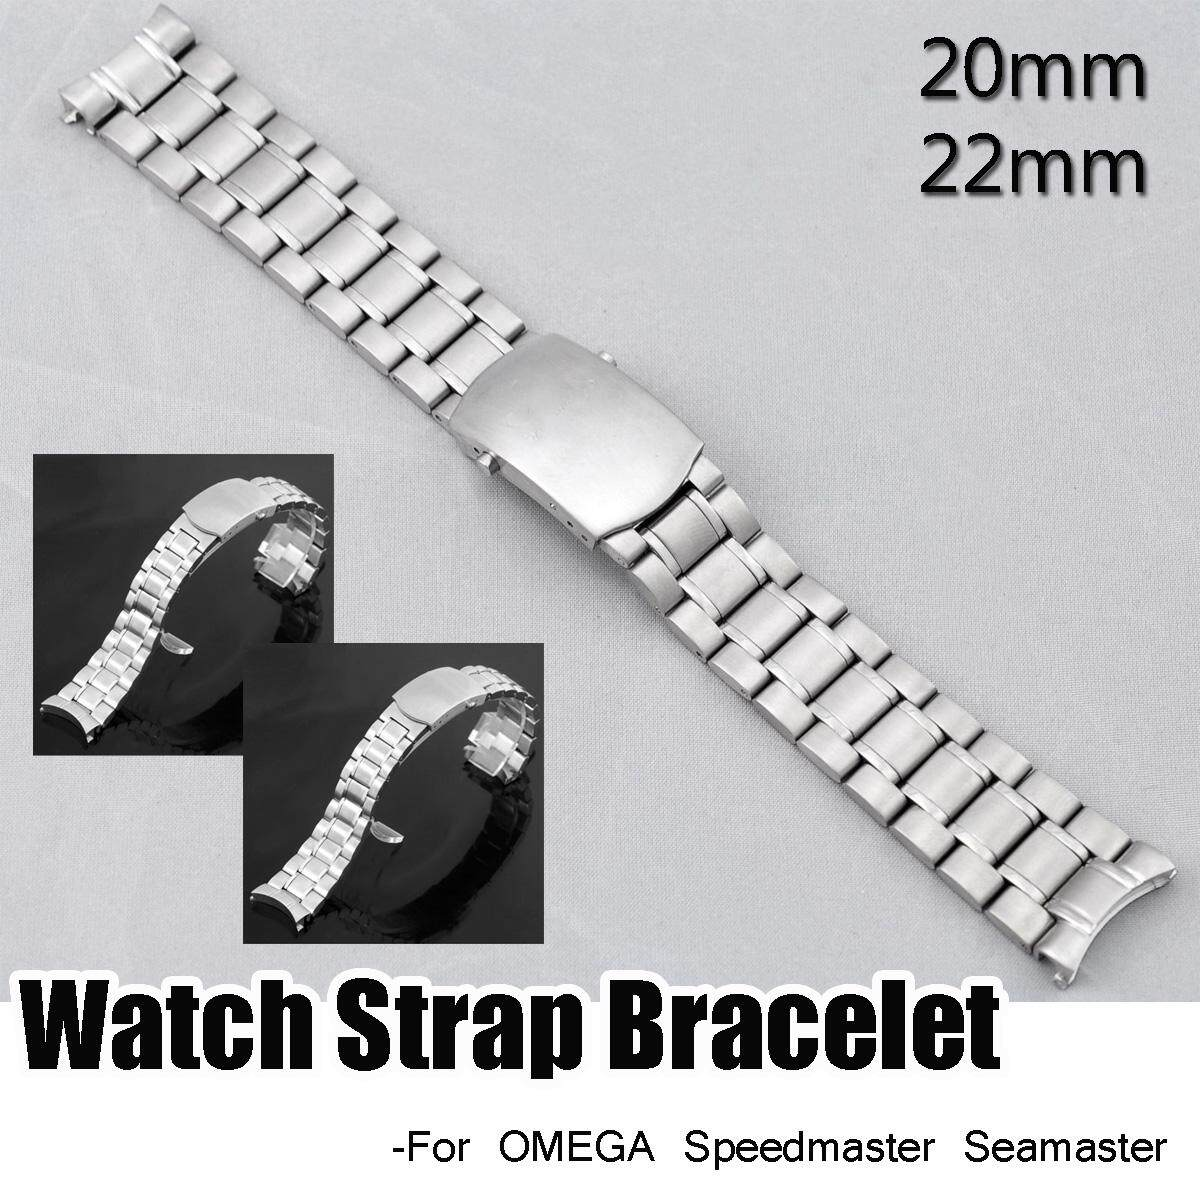 Pengganti S/Steel 22 Mm Tali Jam Gelang untuk Omega Speedmaster Seamaster-Intl